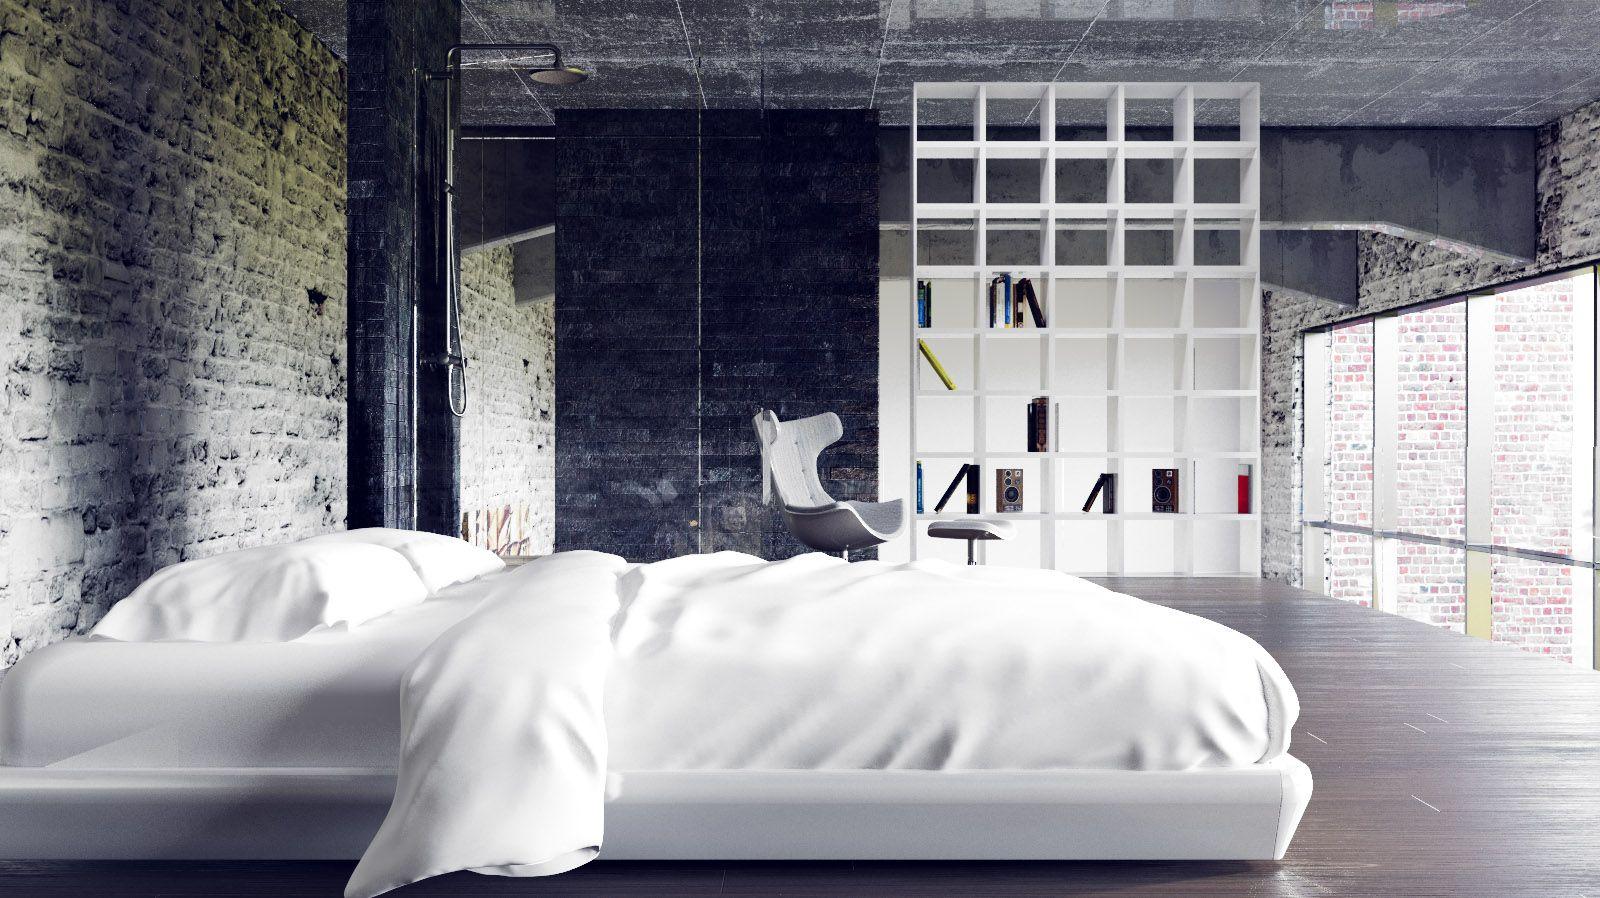 Urban loft bedroom  loft space was  by digital artist Juraj Talcik  Random rooms